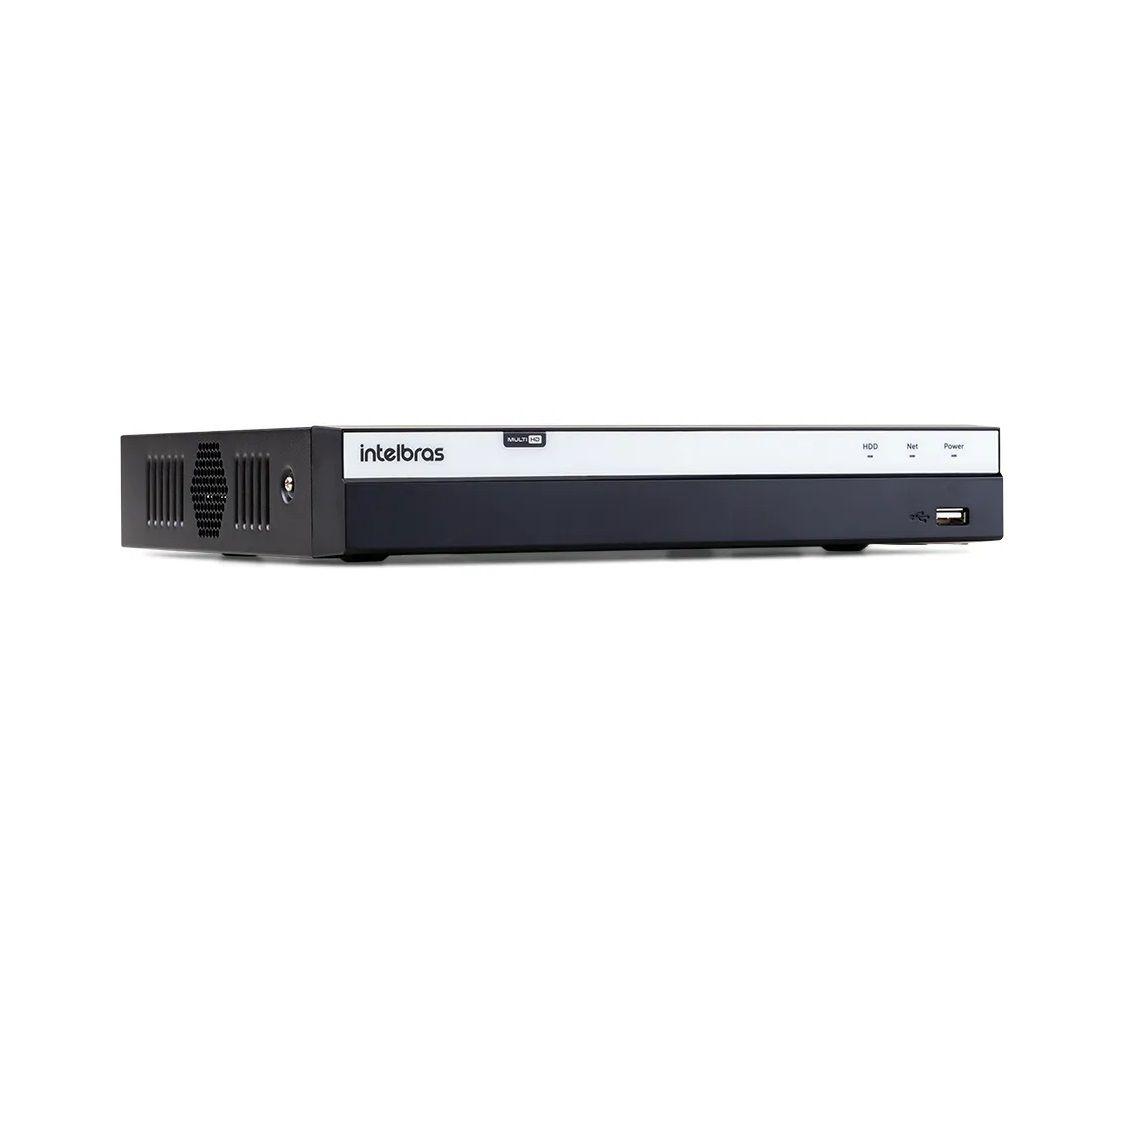 DVR Stand Alone Intelbras MHDX 3108 08 Canais Full HD 1080p Multi HD + 04 Canais IP 5 Mp + HD WD Purple 2TB